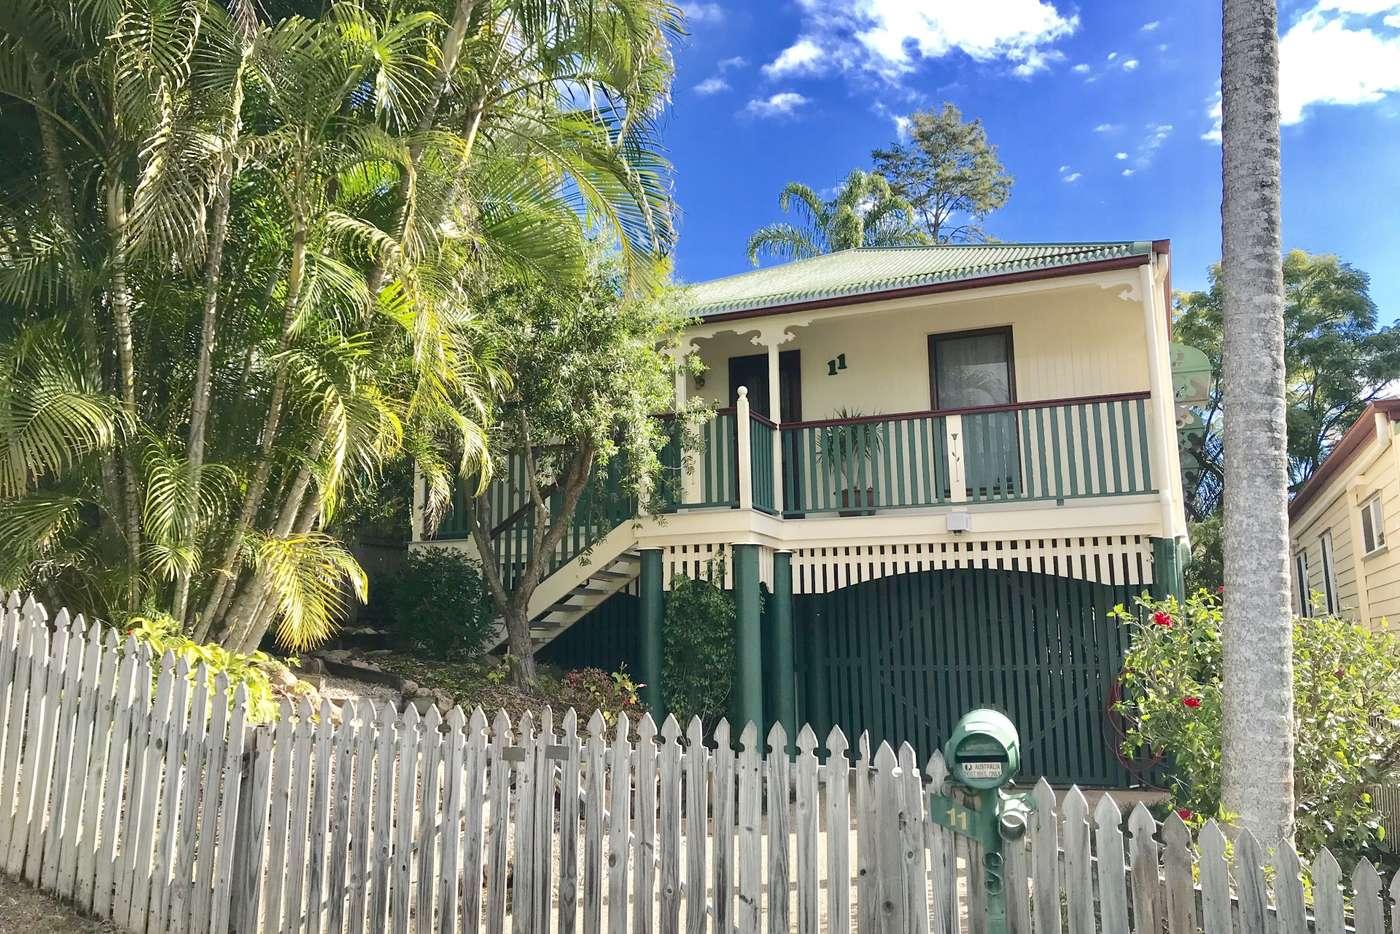 Main view of Homely house listing, 11 Howitt Street, Taringa QLD 4068